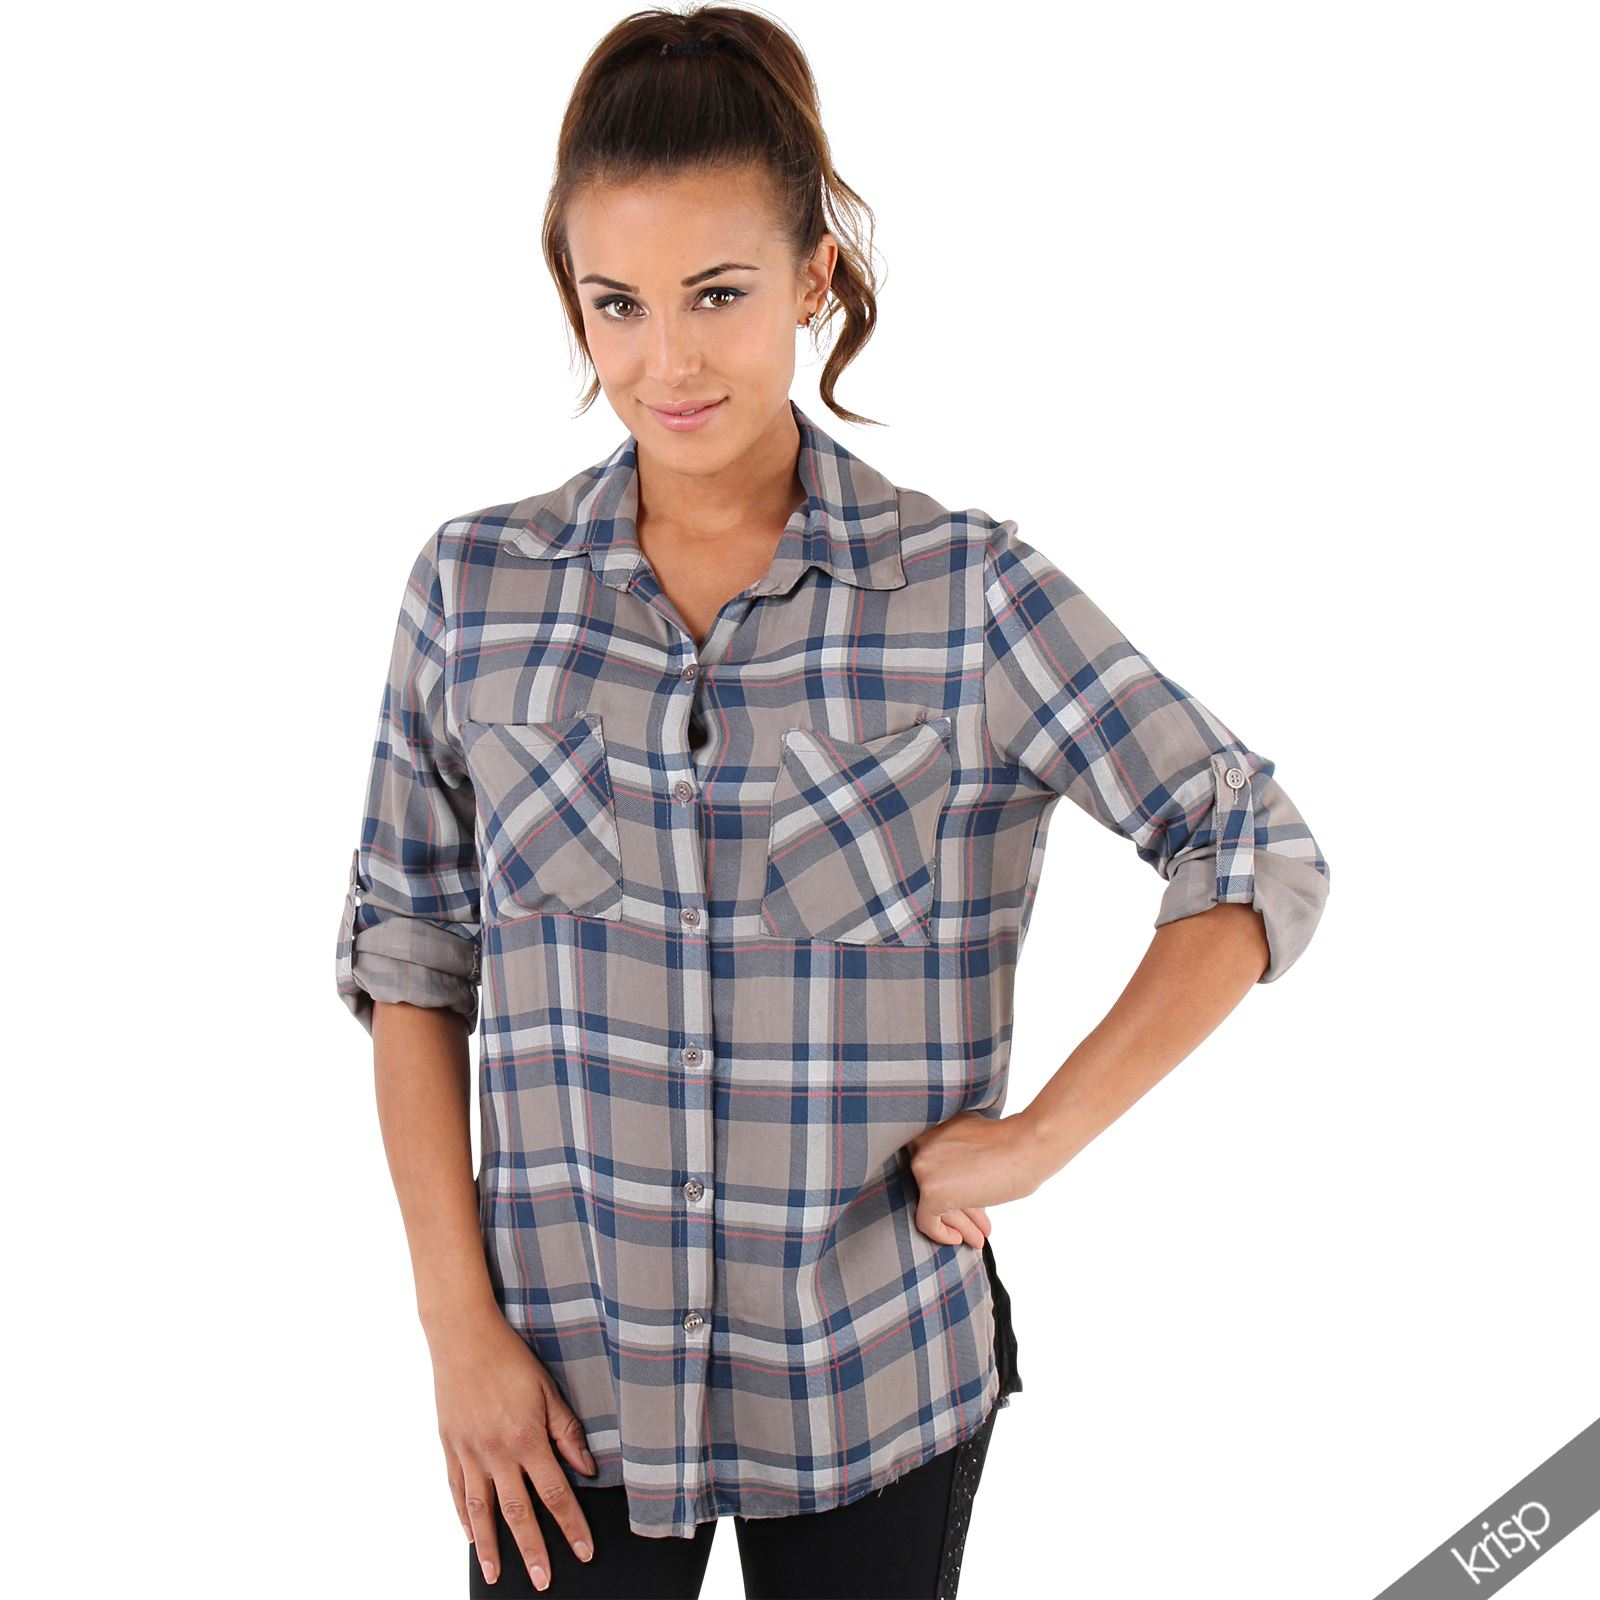 damen karierte hemdbluse holzf llerhemd lumberjack karo hemd bluse lang ebay. Black Bedroom Furniture Sets. Home Design Ideas